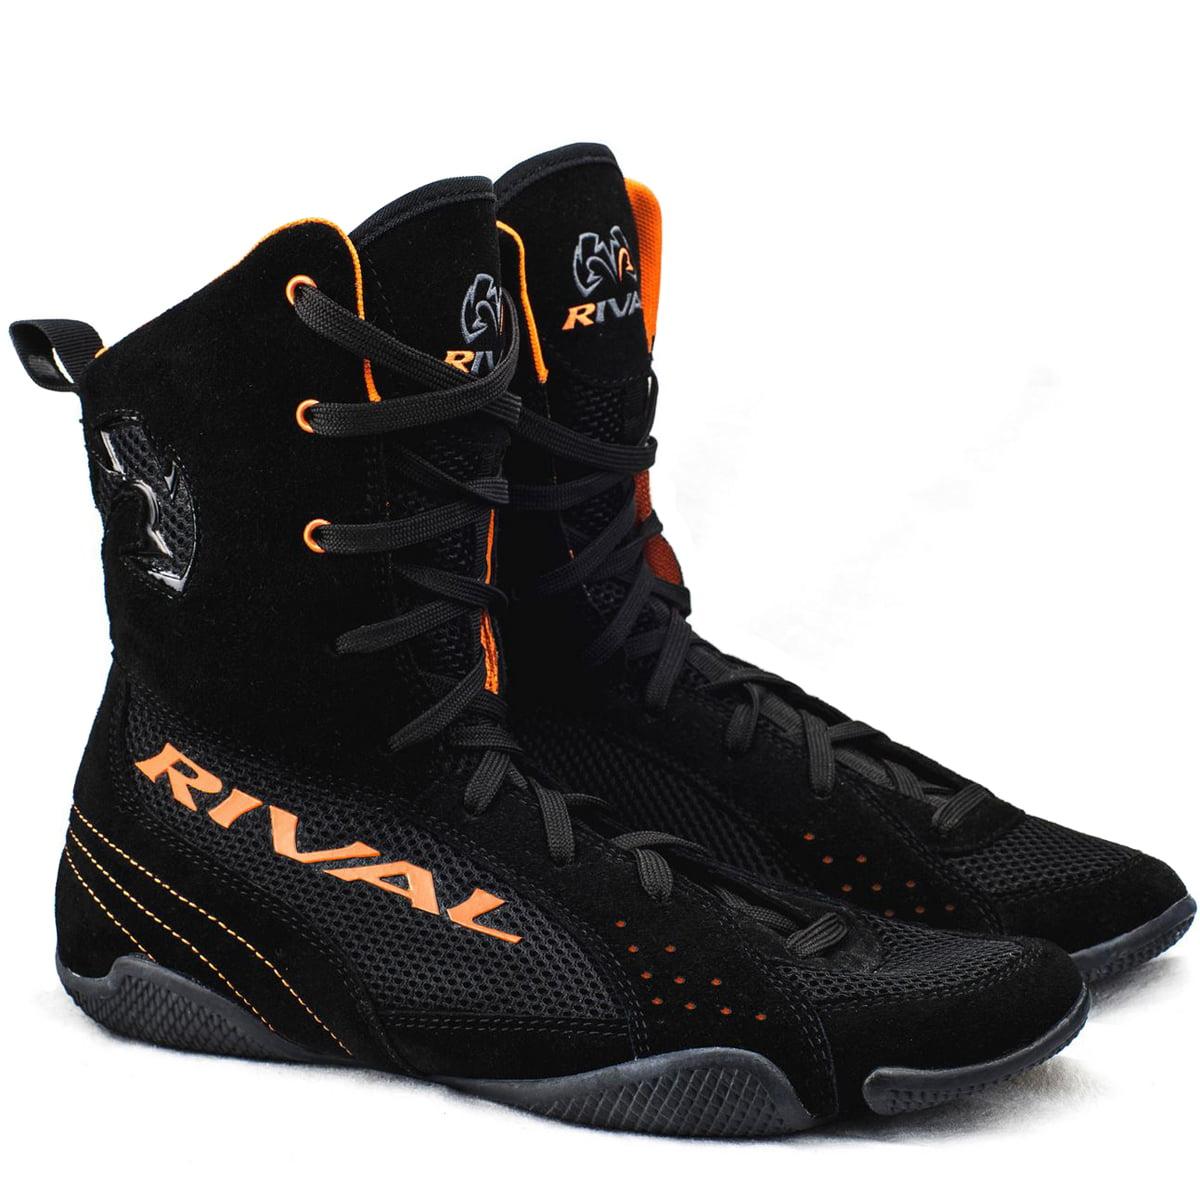 Rival Boxing Hi-Top Mesh Paneled RSX-ONE V2 Boots - Black/Orange